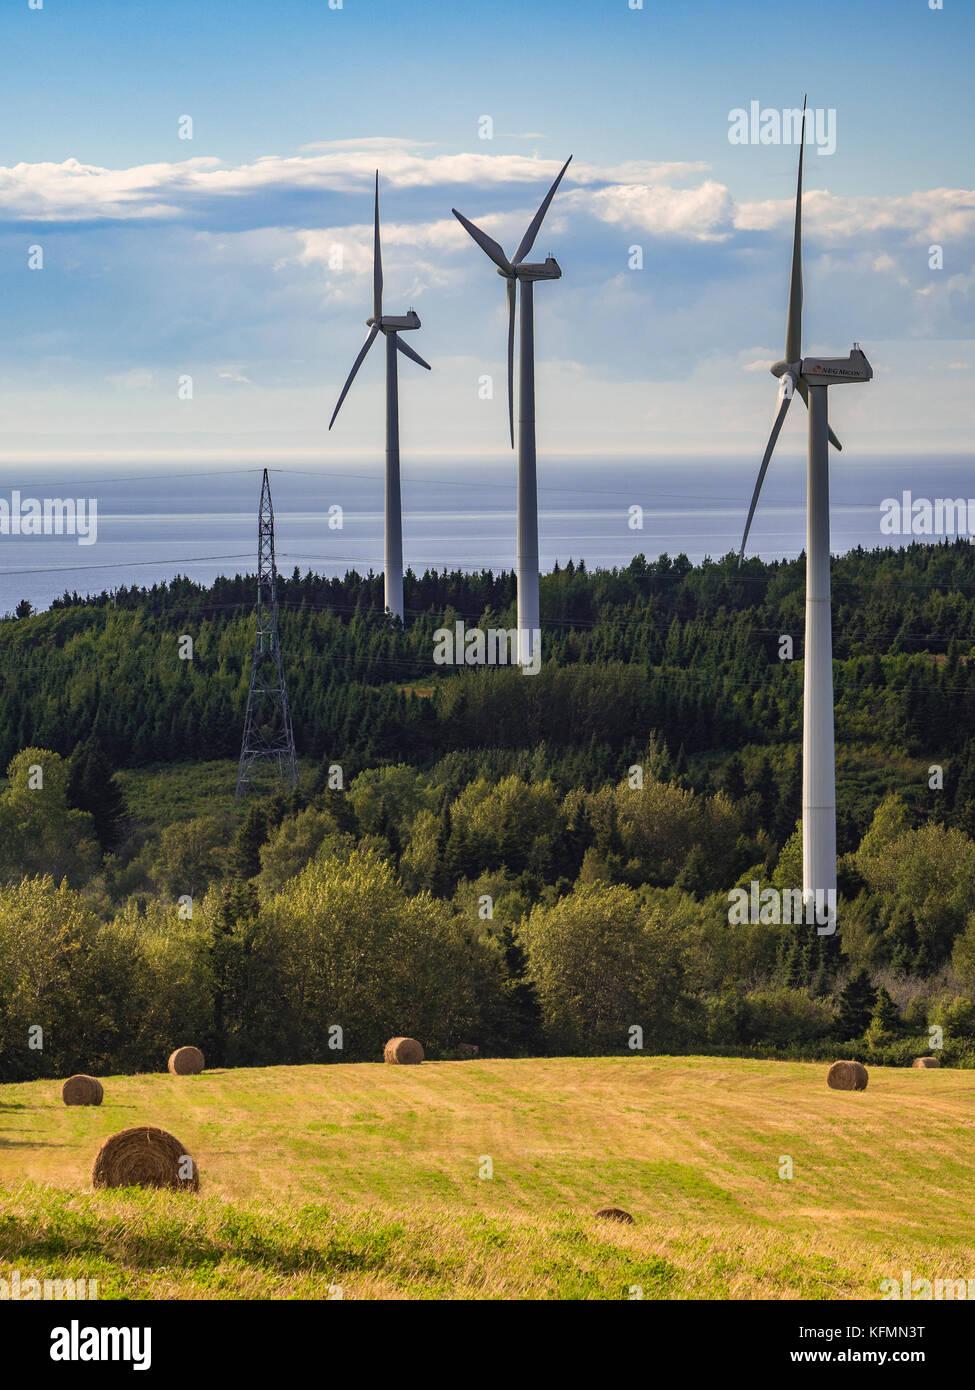 Windpark Le Nordais Mühle Park wind generation Bahnhof Dorf Chibougamau, Gaspe Halbinsel, Quebec, Kanada Stockbild